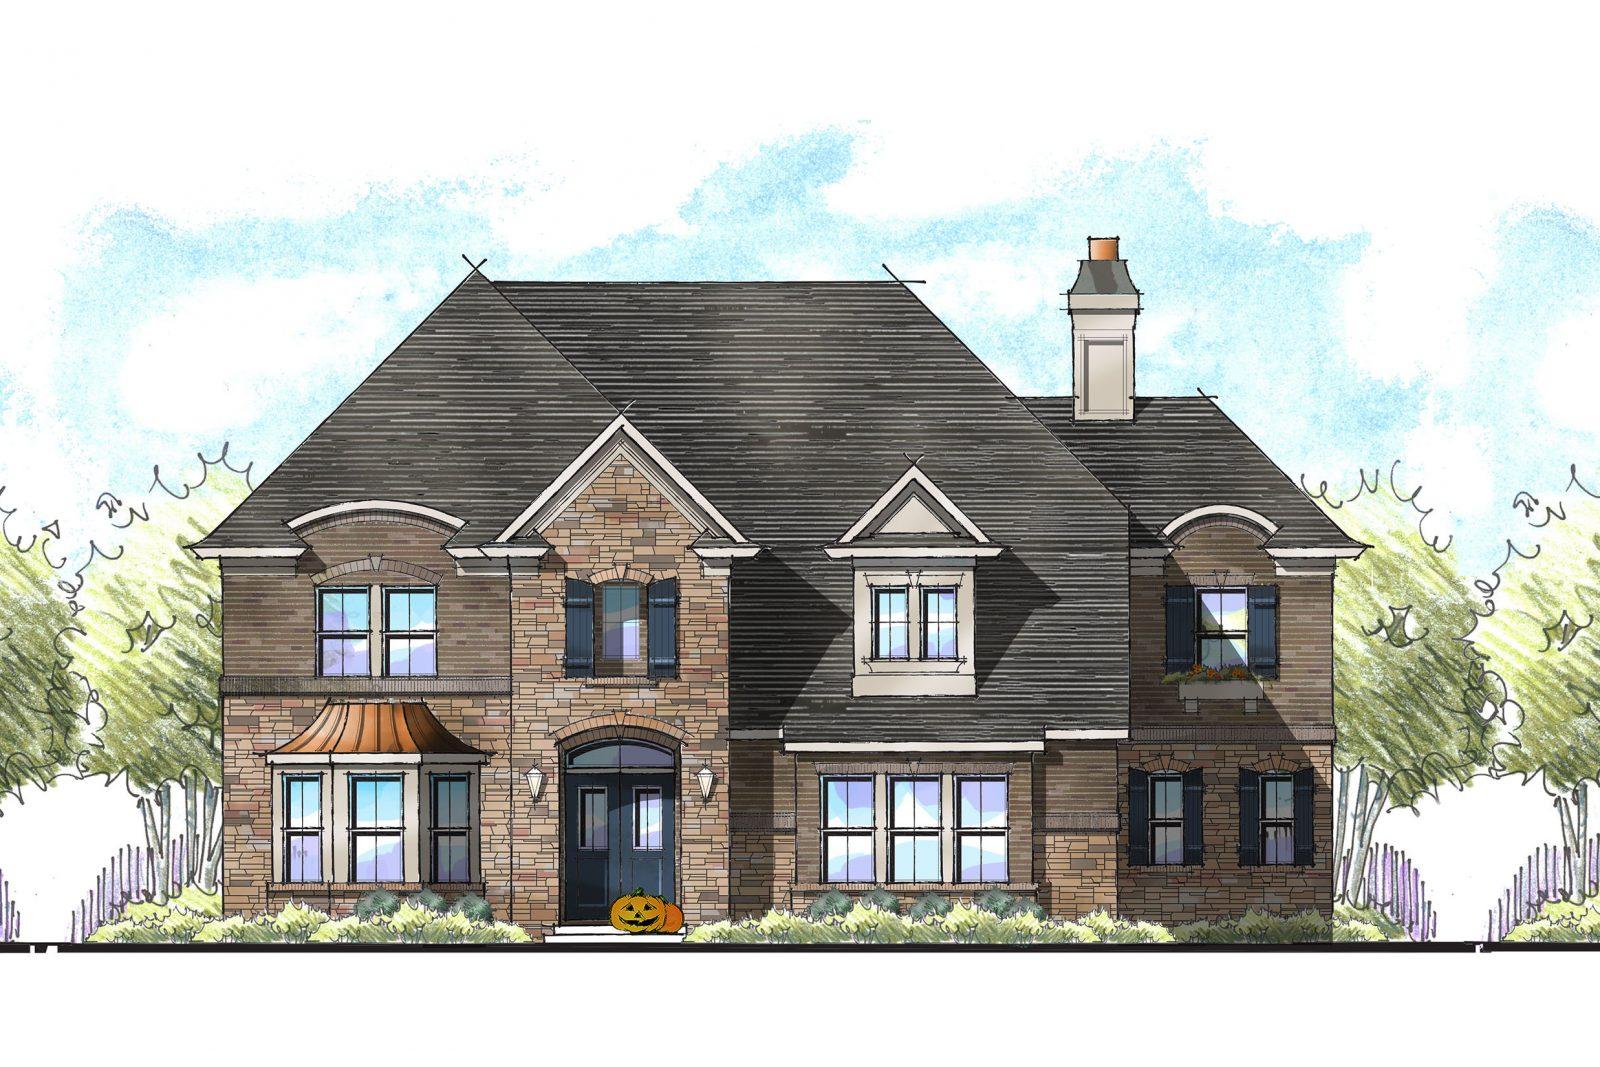 Choosing Elevation Styles Housing Design Matters